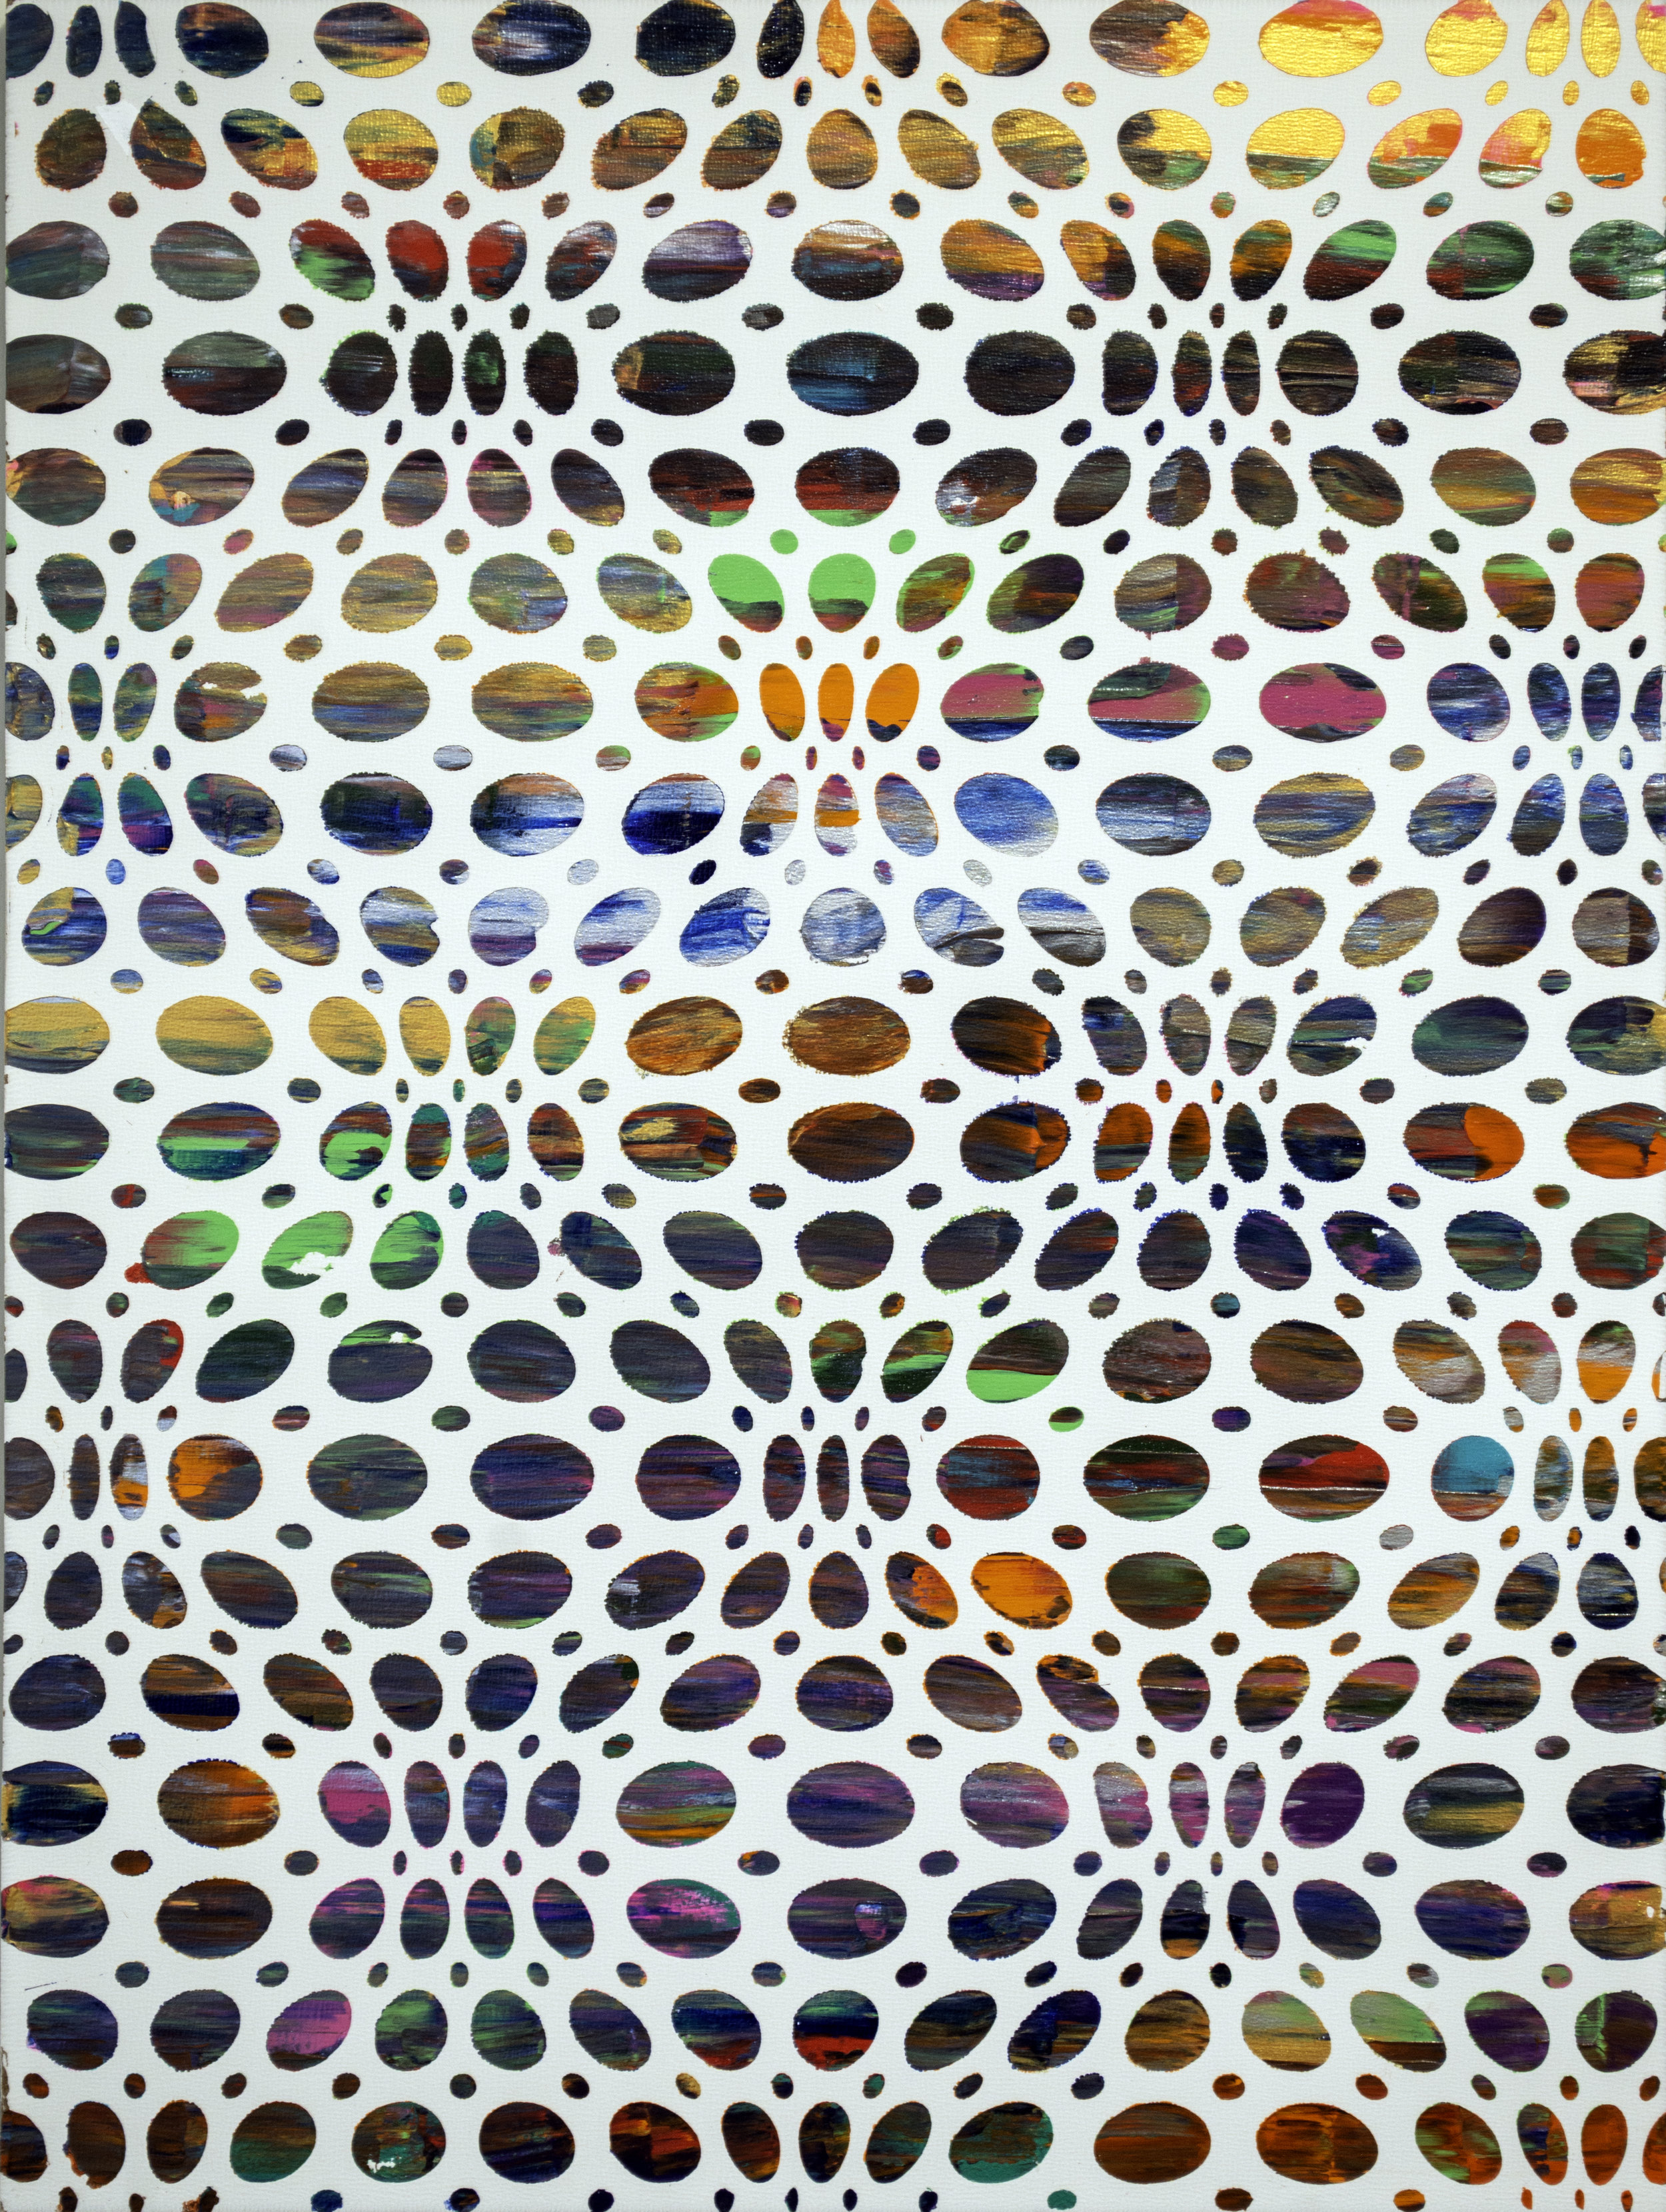 HUE Gallery of Contemporary Art - Sean Christopher Ward - Bead Curtain - Acrylic on MDF - 12x16 - 2019 - $375.jpg